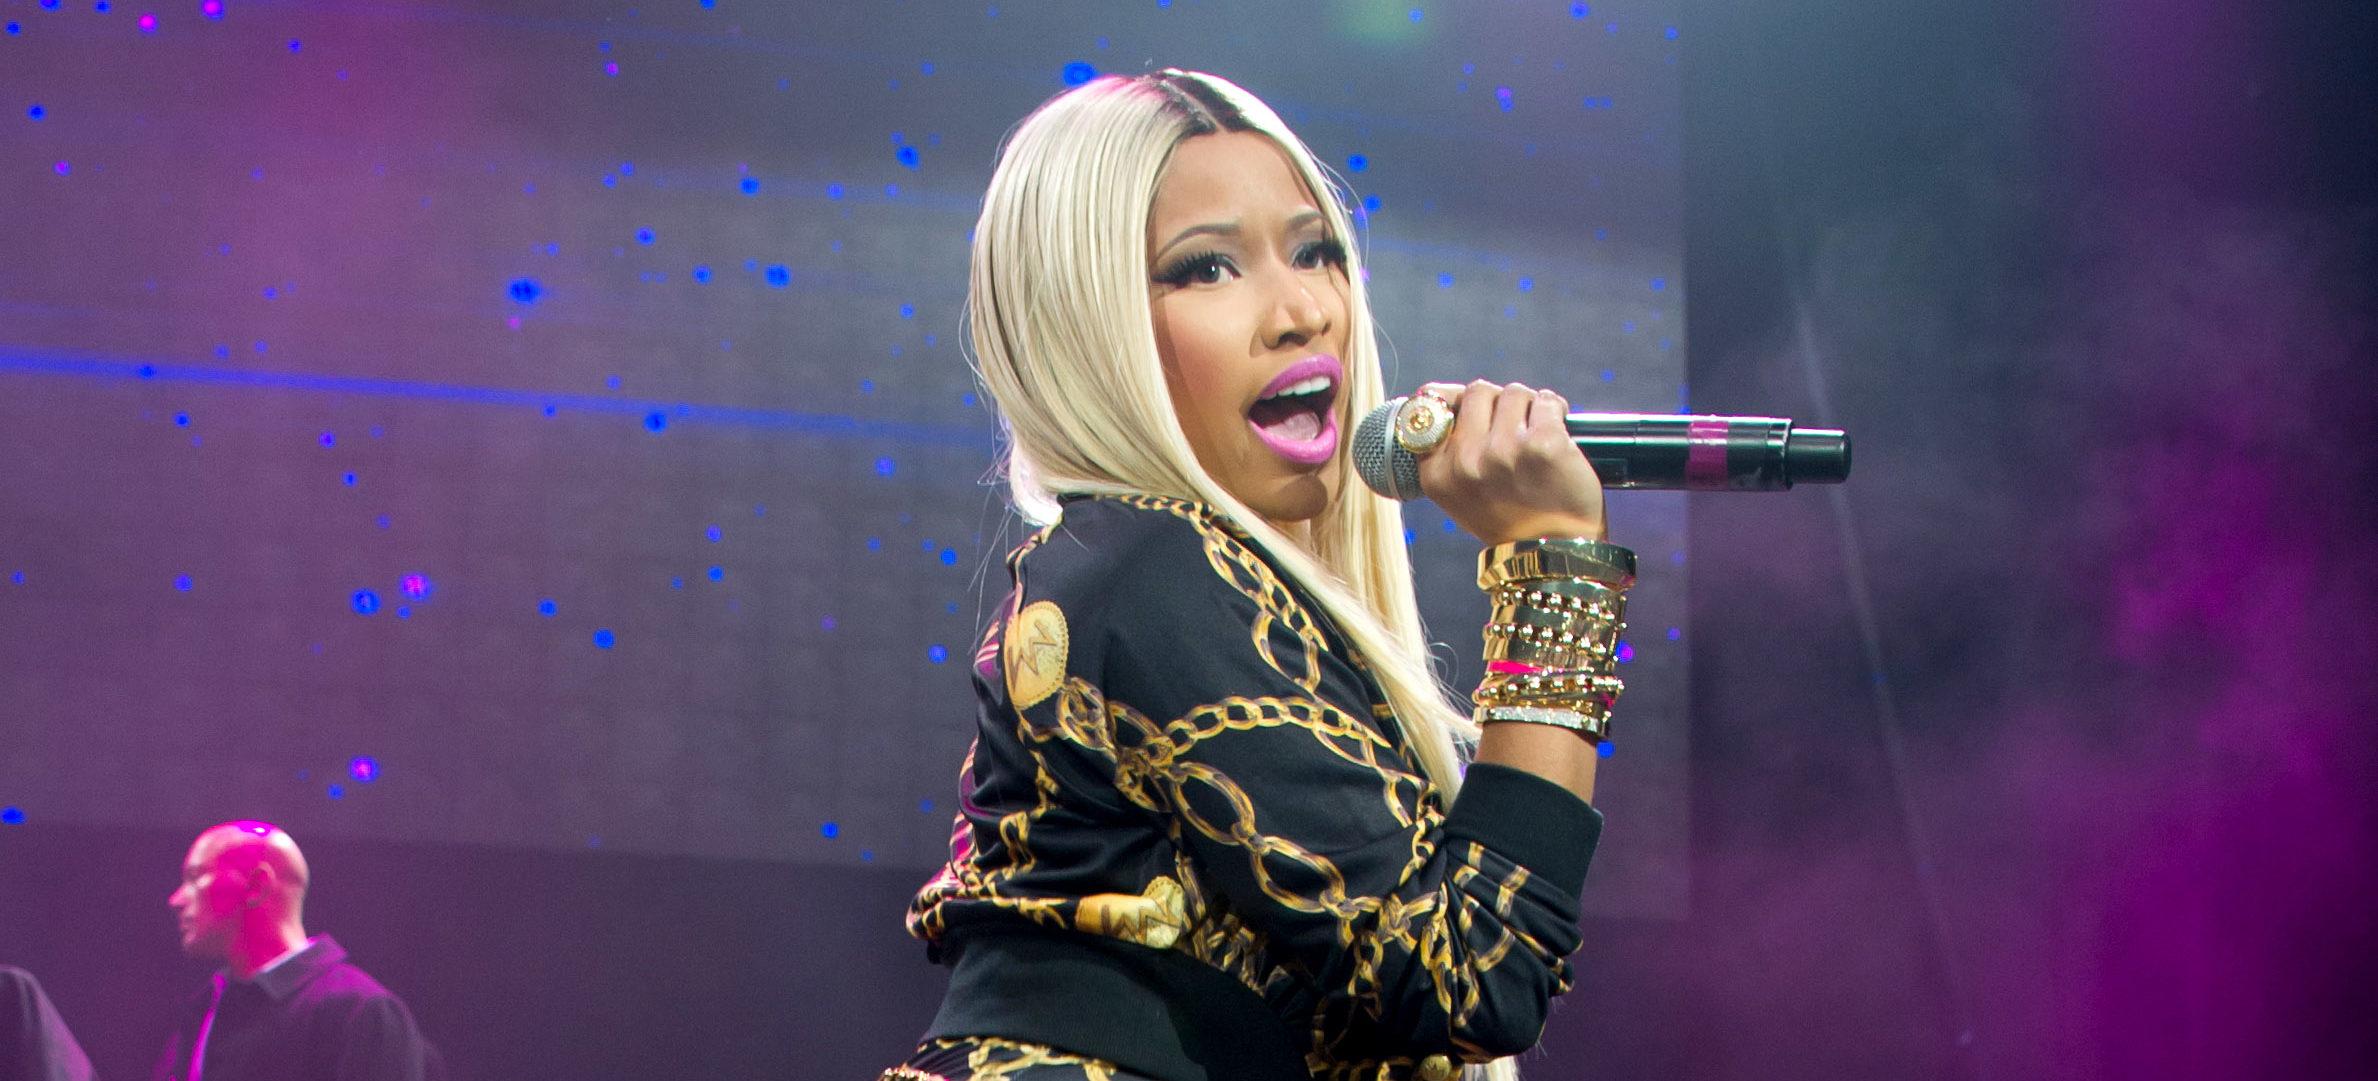 Nicki Minaj fará show exclusivo em São Paulo